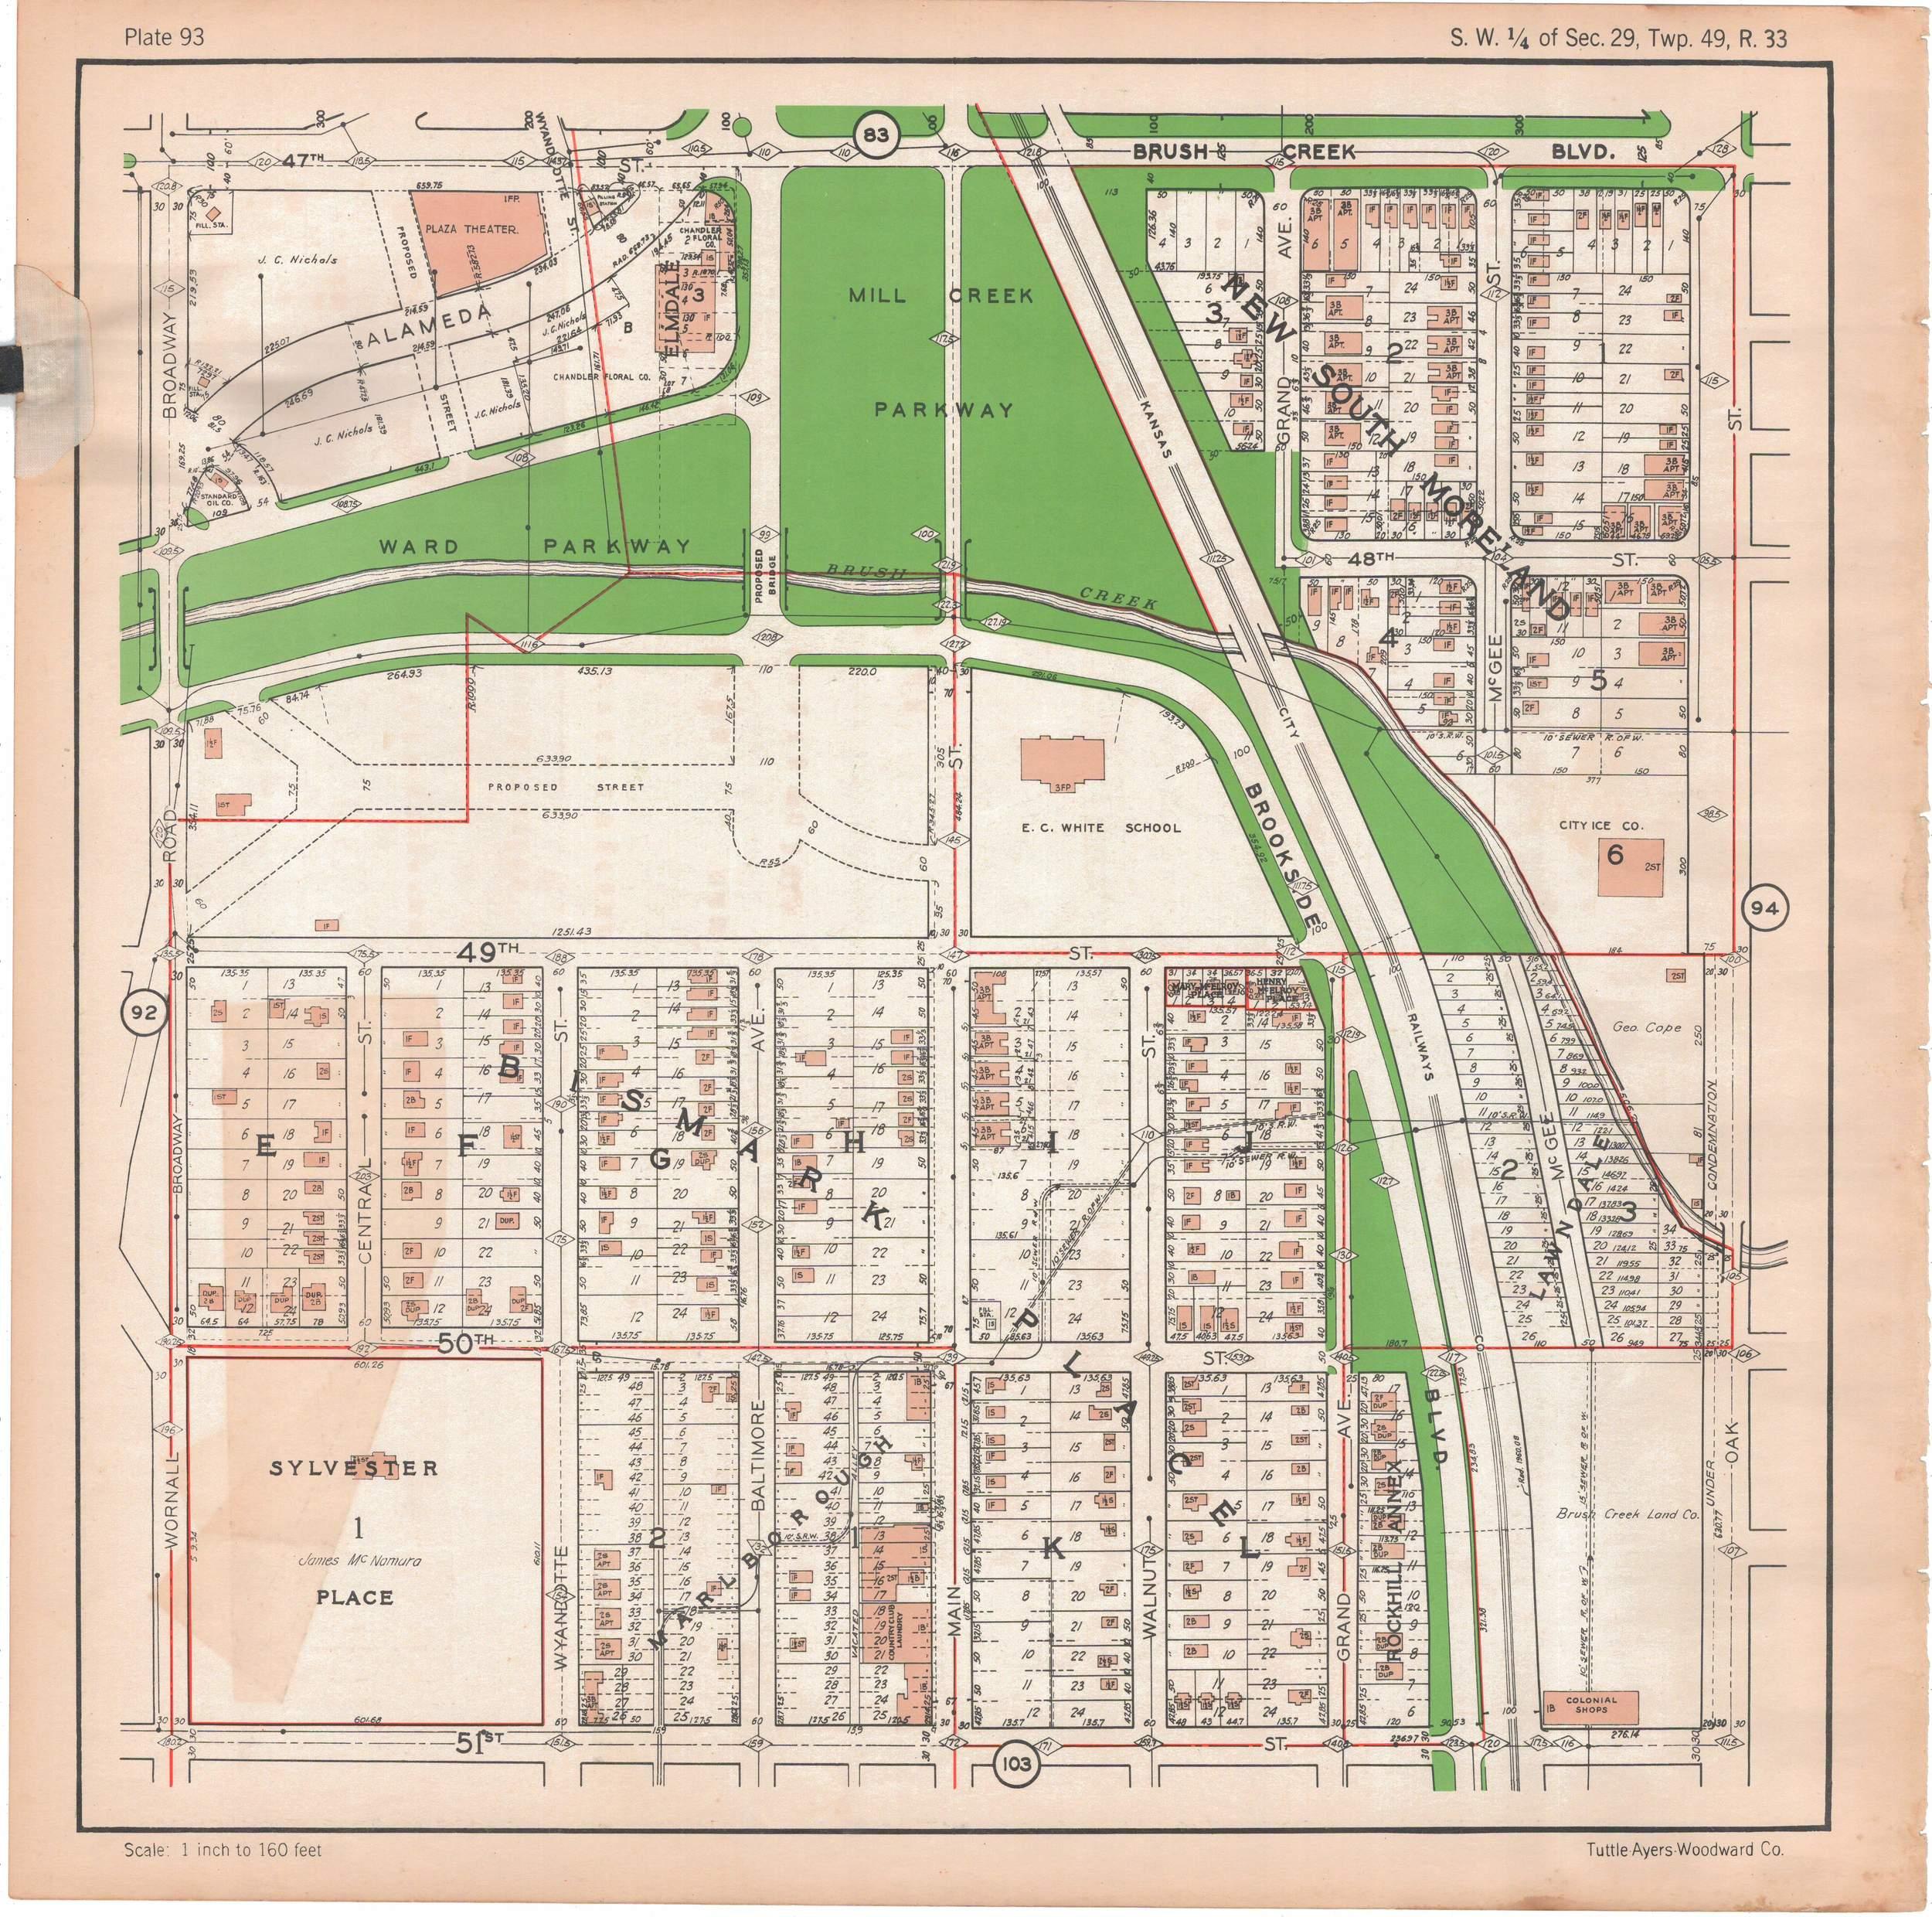 1925 TUTTLE_AYERS_Plate 93.JPG